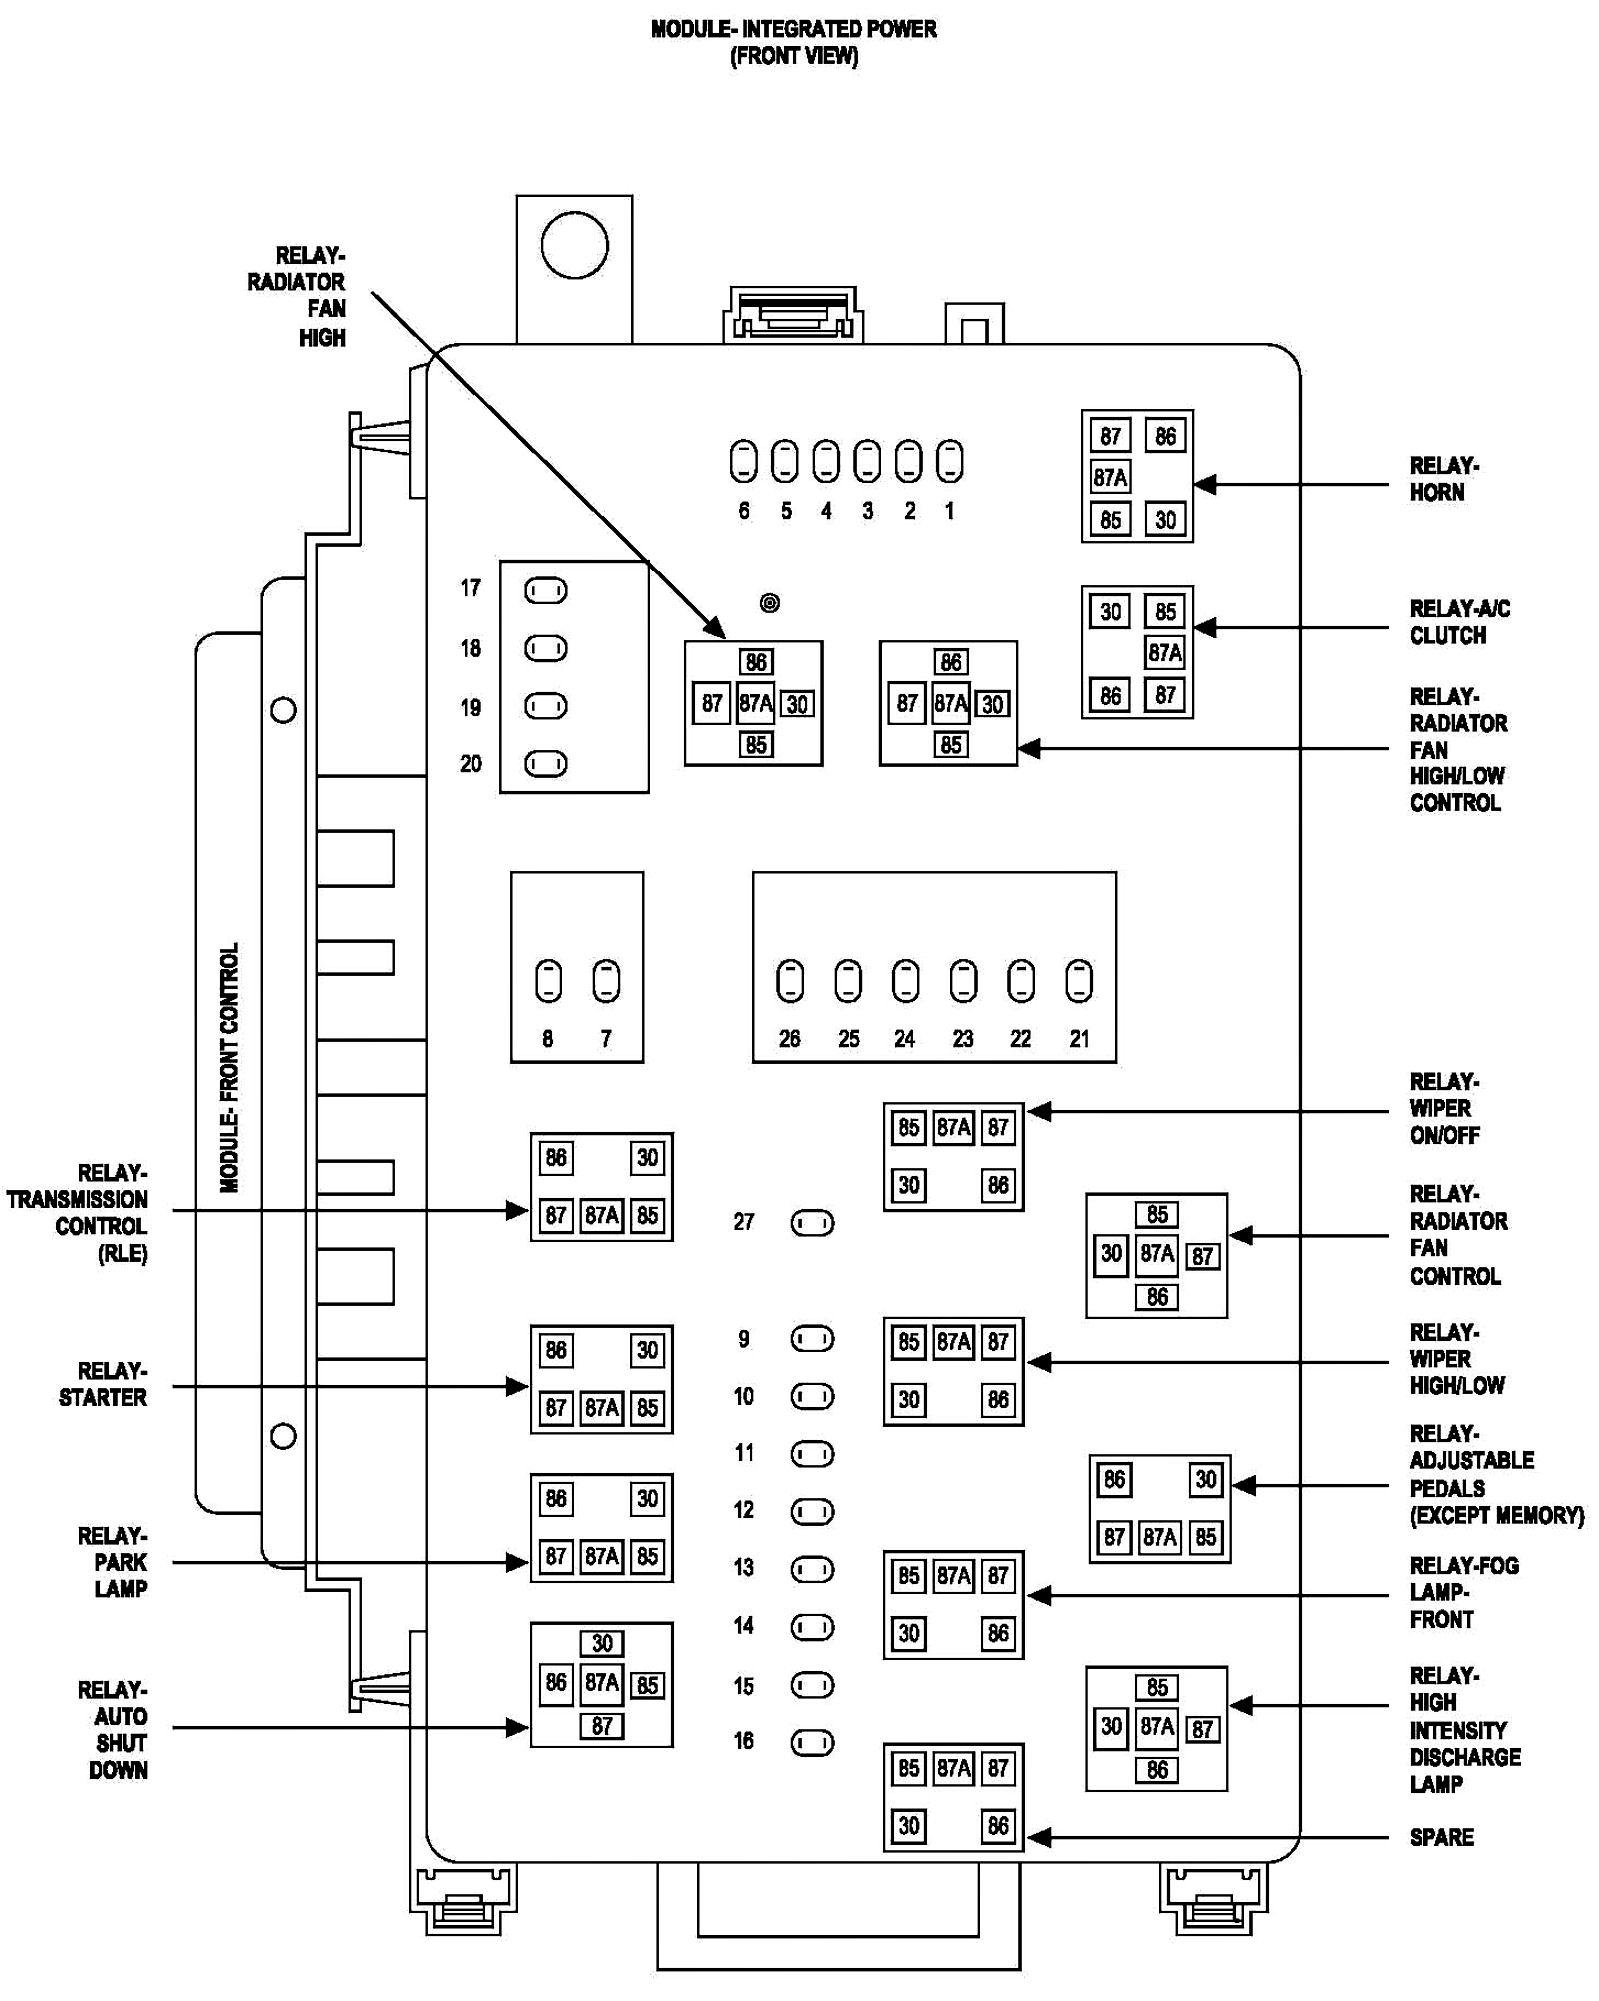 Swell 2011 Chrysler 300 Fuse Diagram Online Wiring Diagram Wiring Cloud Xempagosophoxytasticioscodnessplanboapumohammedshrineorg